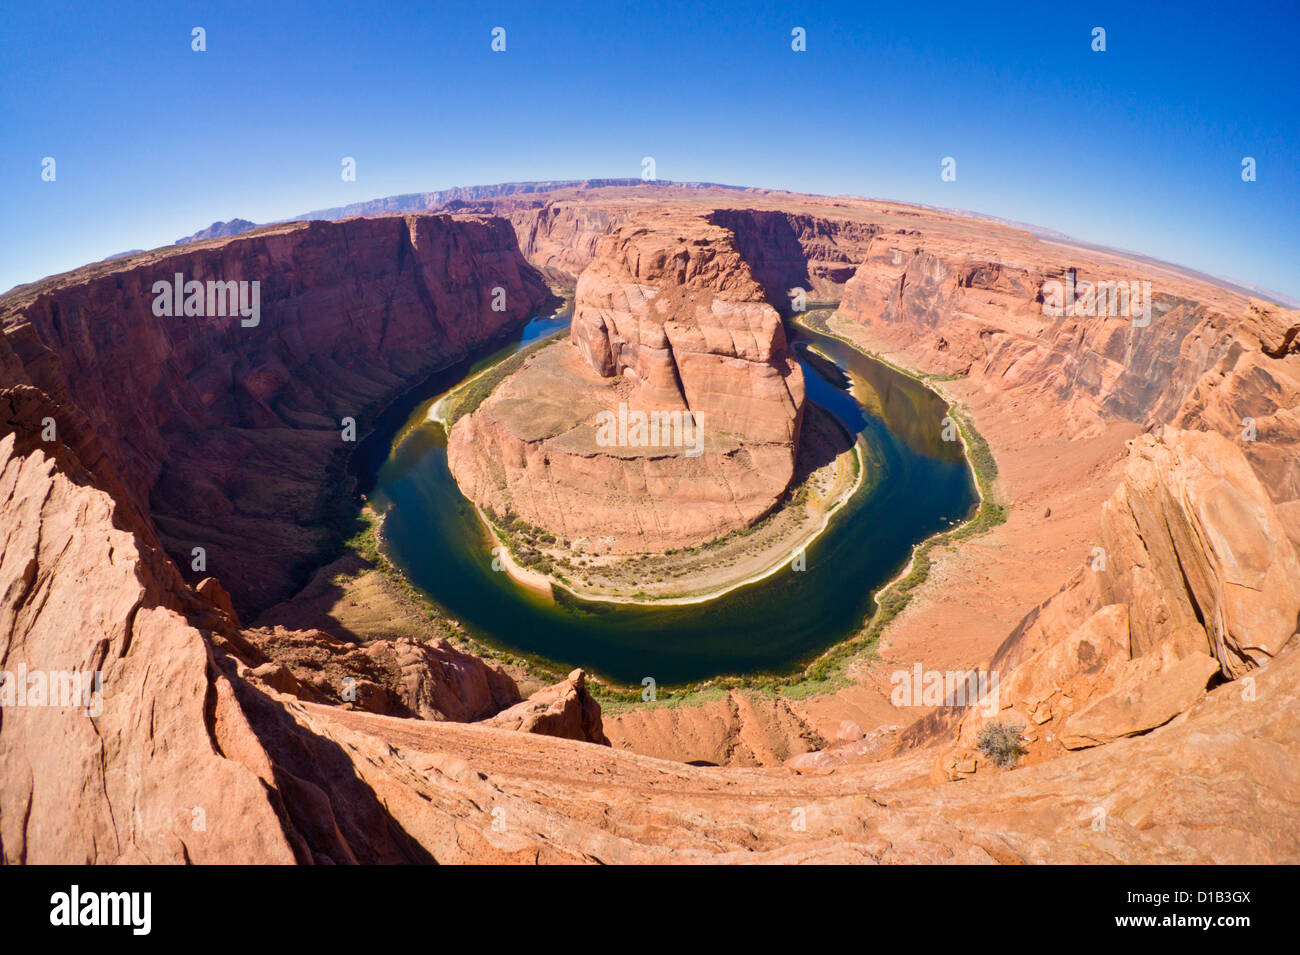 Horseshoe bend on the colorado river at Page Arizona USA  United States of America - Stock Image